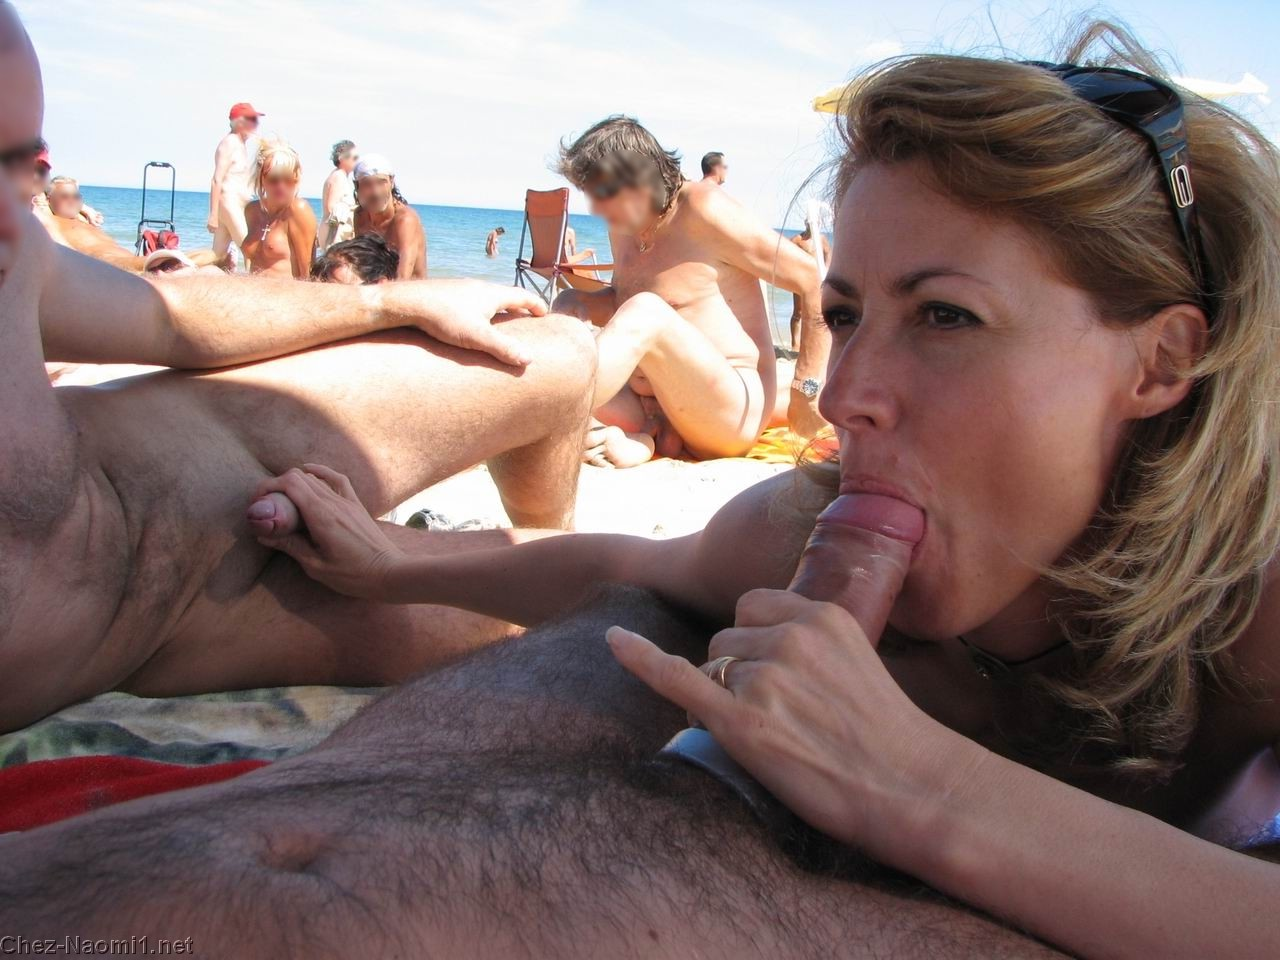 Nude Public Voyeur - Free Mature Porn Thumb Image 72499